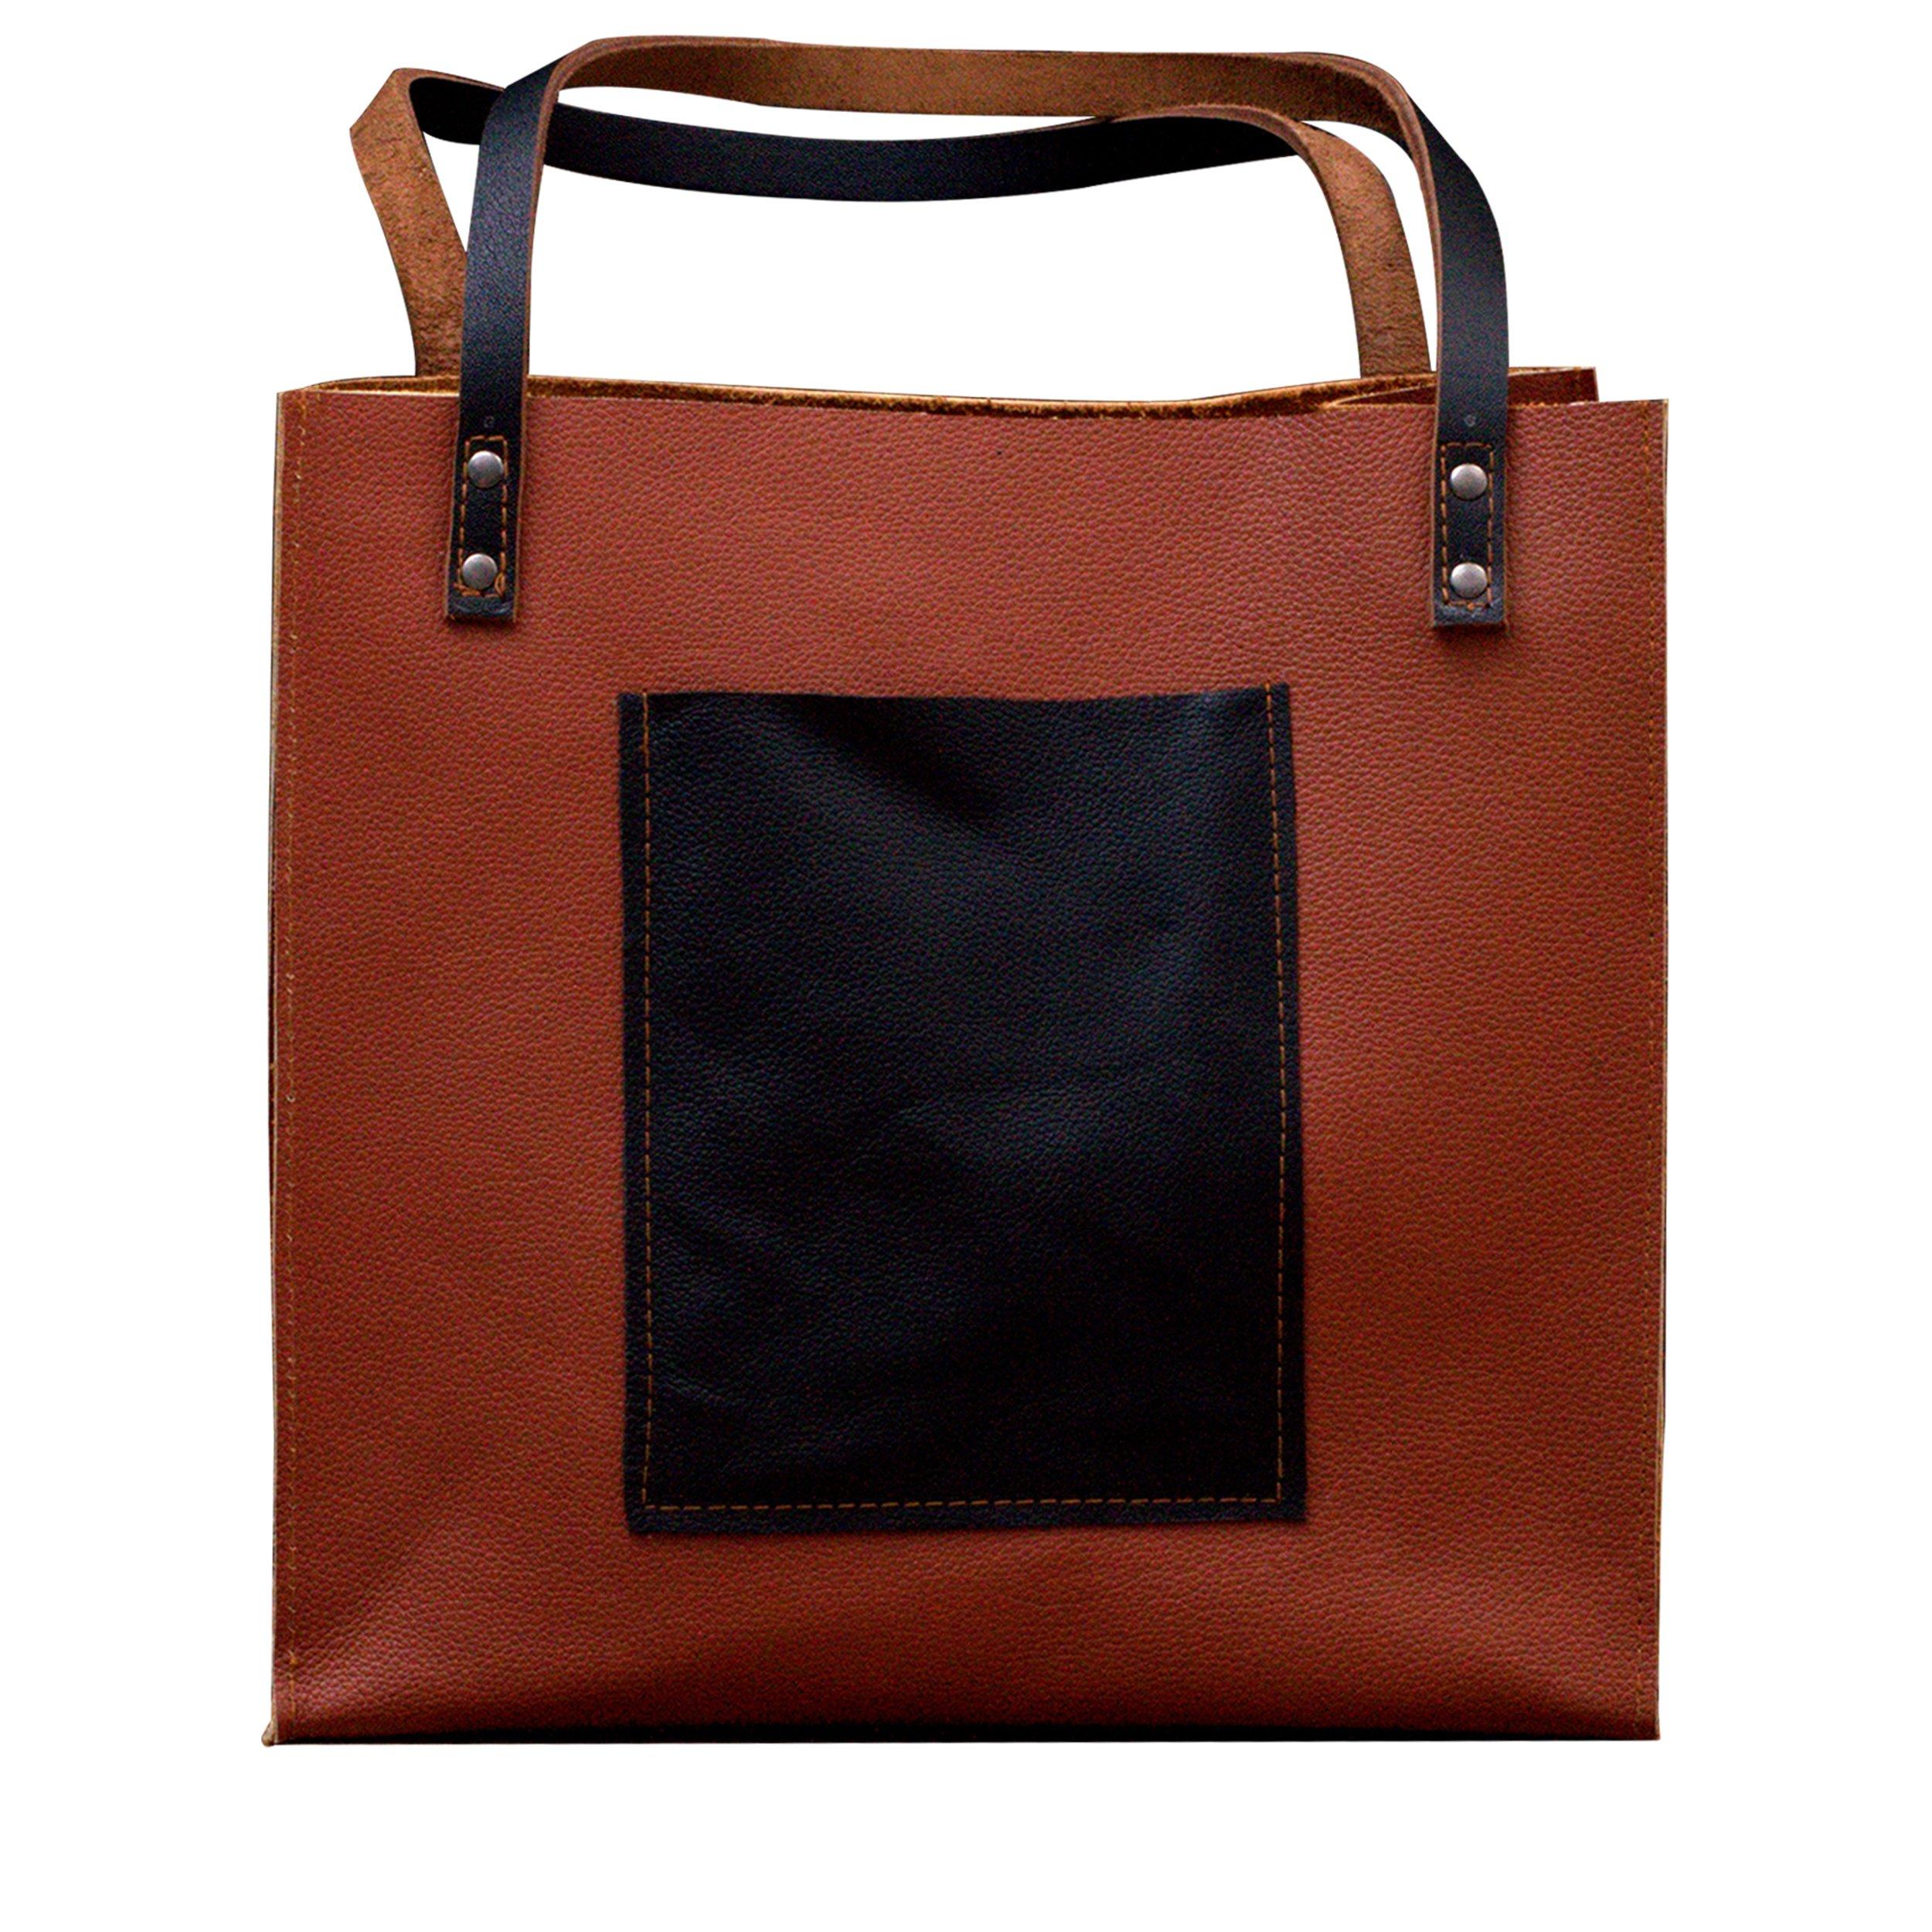 MONT5 Handcrafted Everyday Large CarryAll Women Leather Tote Shoulder Handbag